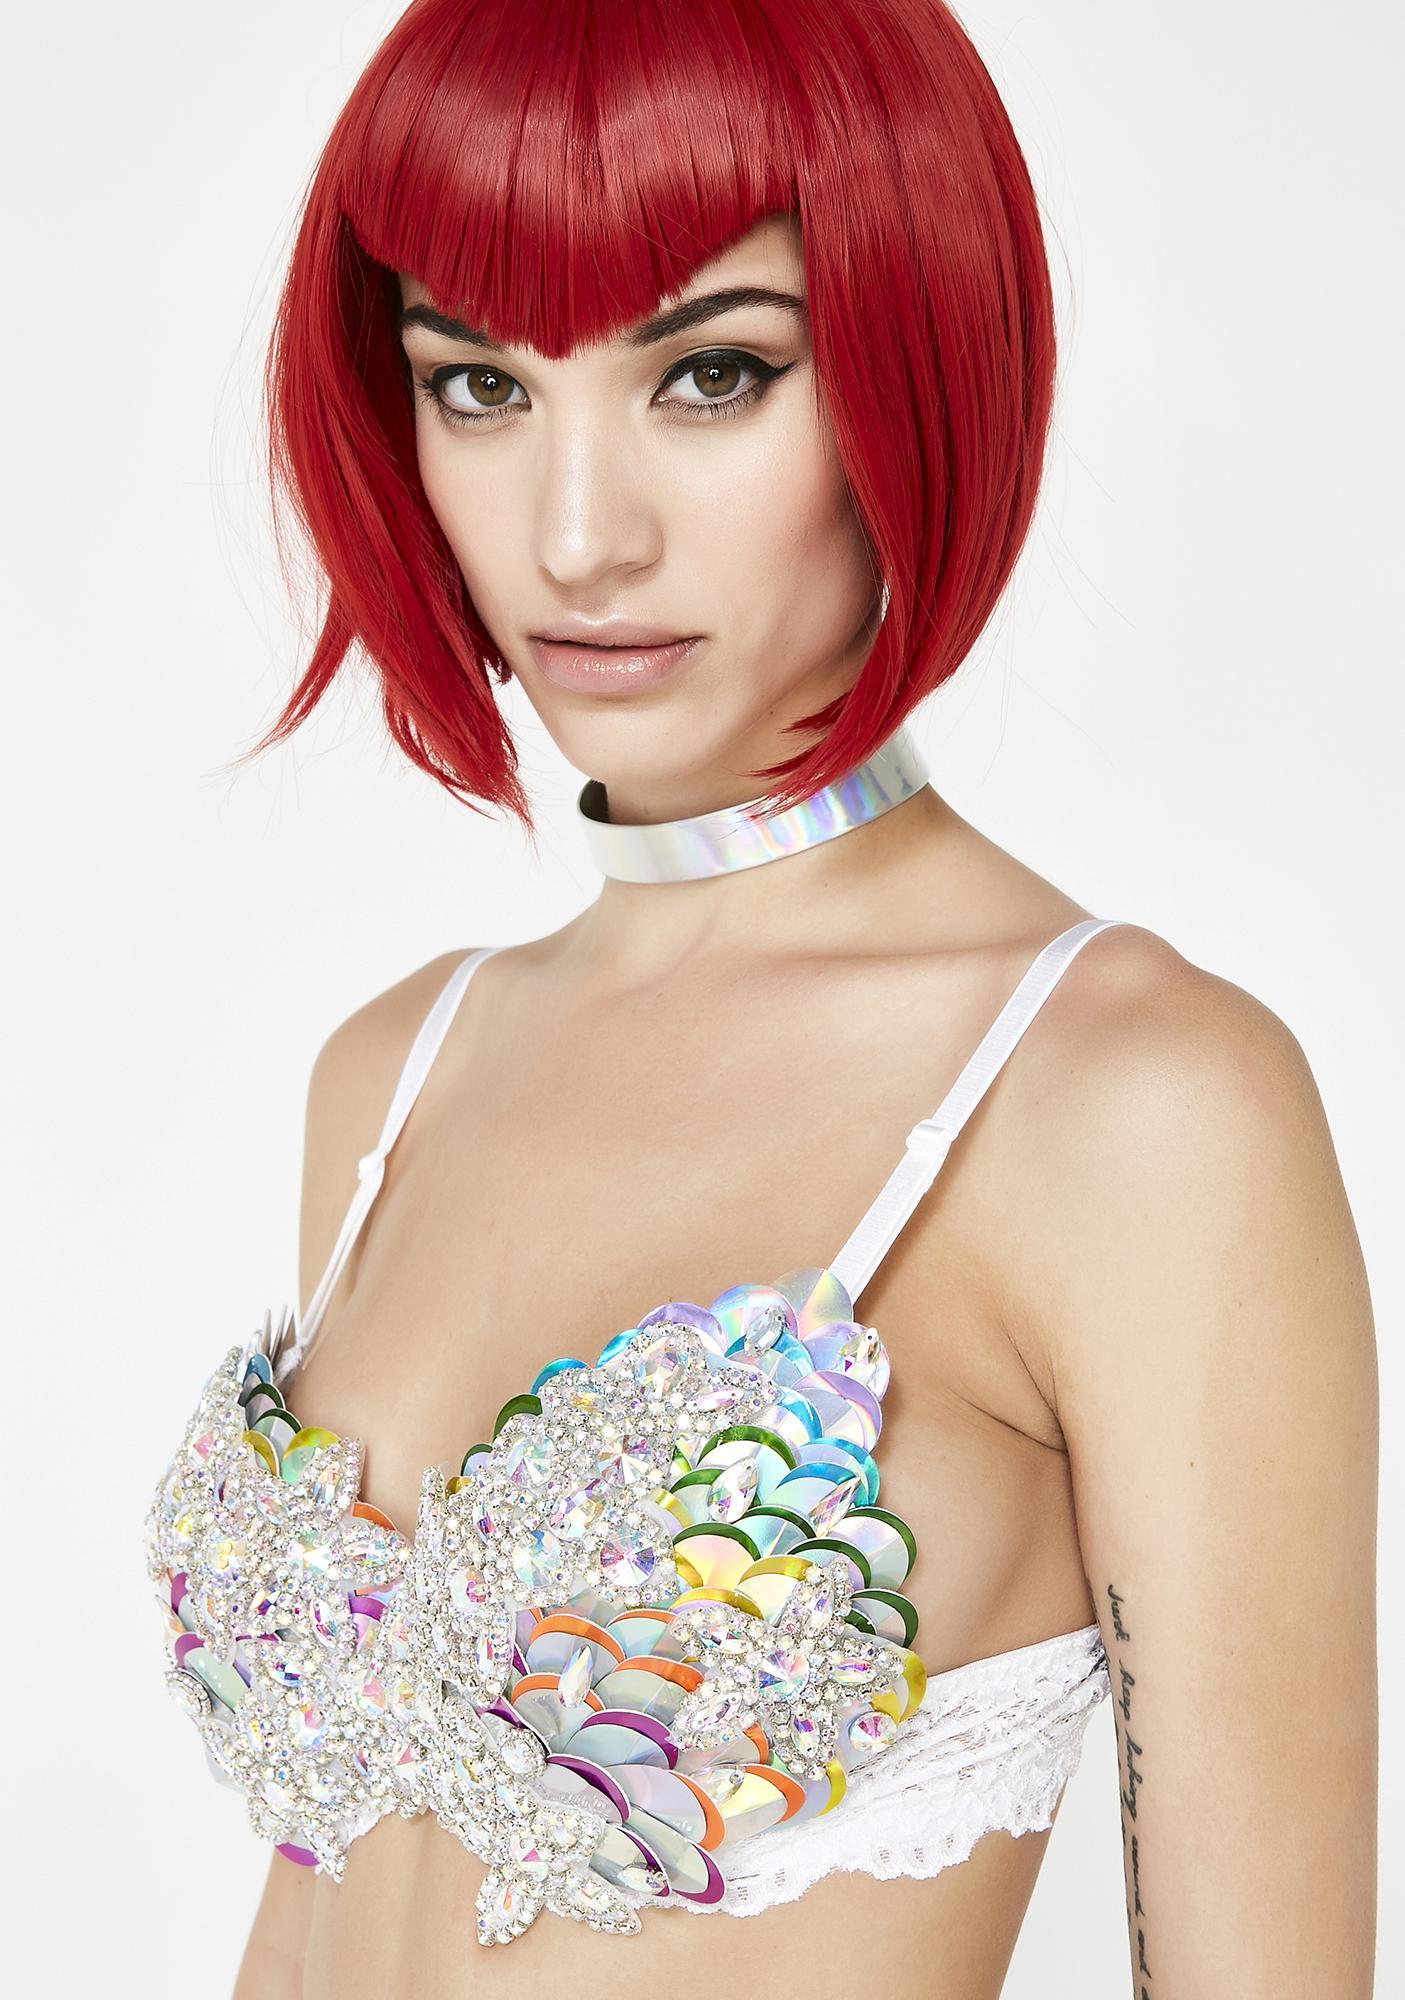 The Lyte Couture Mermaid Rainbow Rave Bra